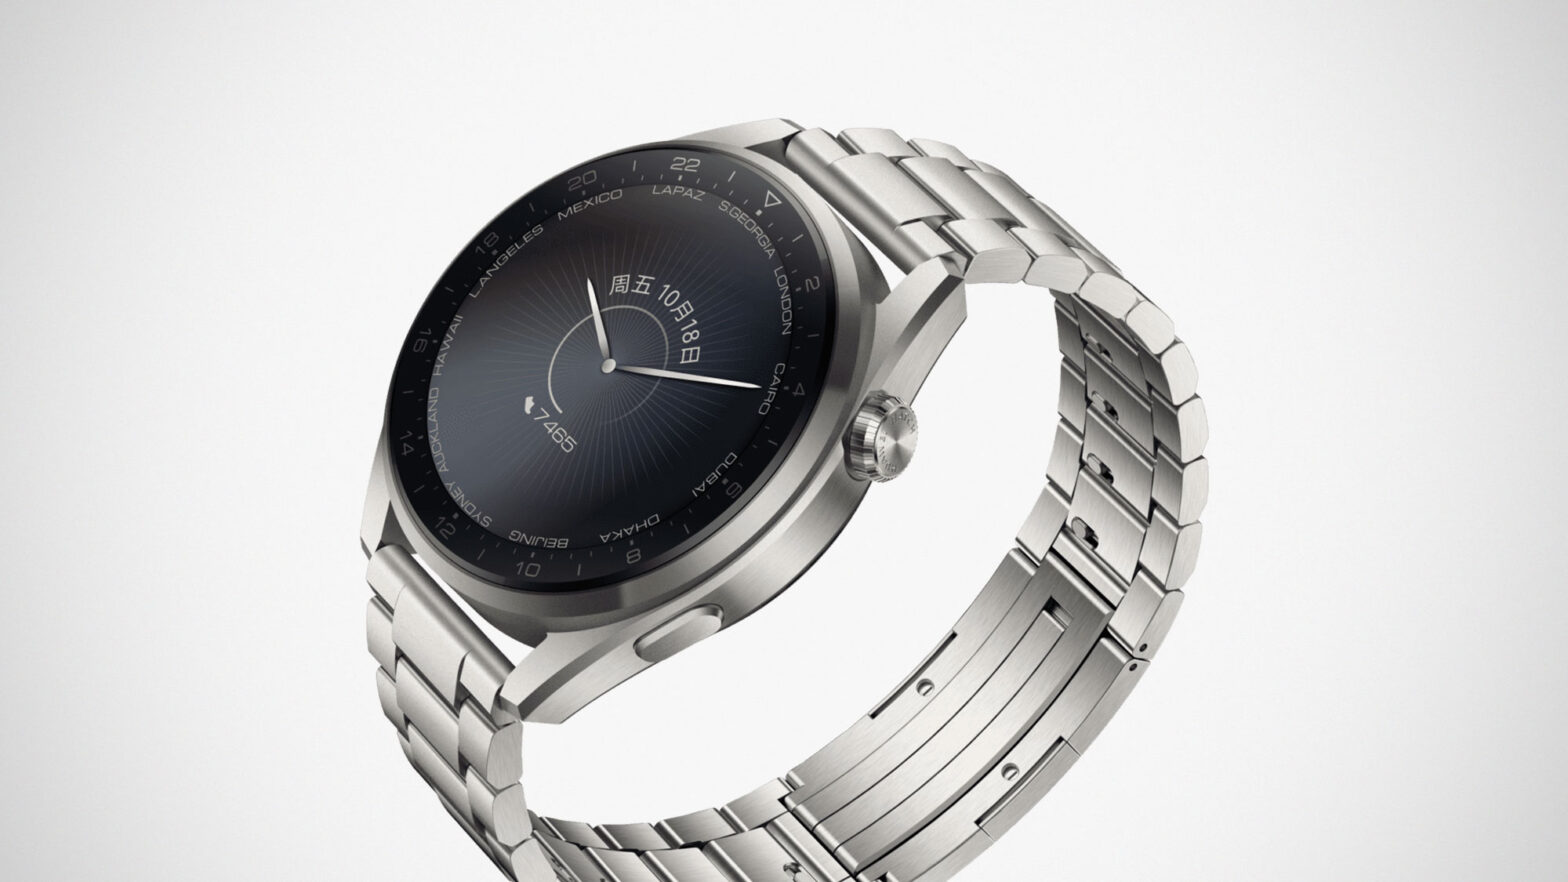 Huawei Watch 3 Pro Smartwatch with HarmonyOS